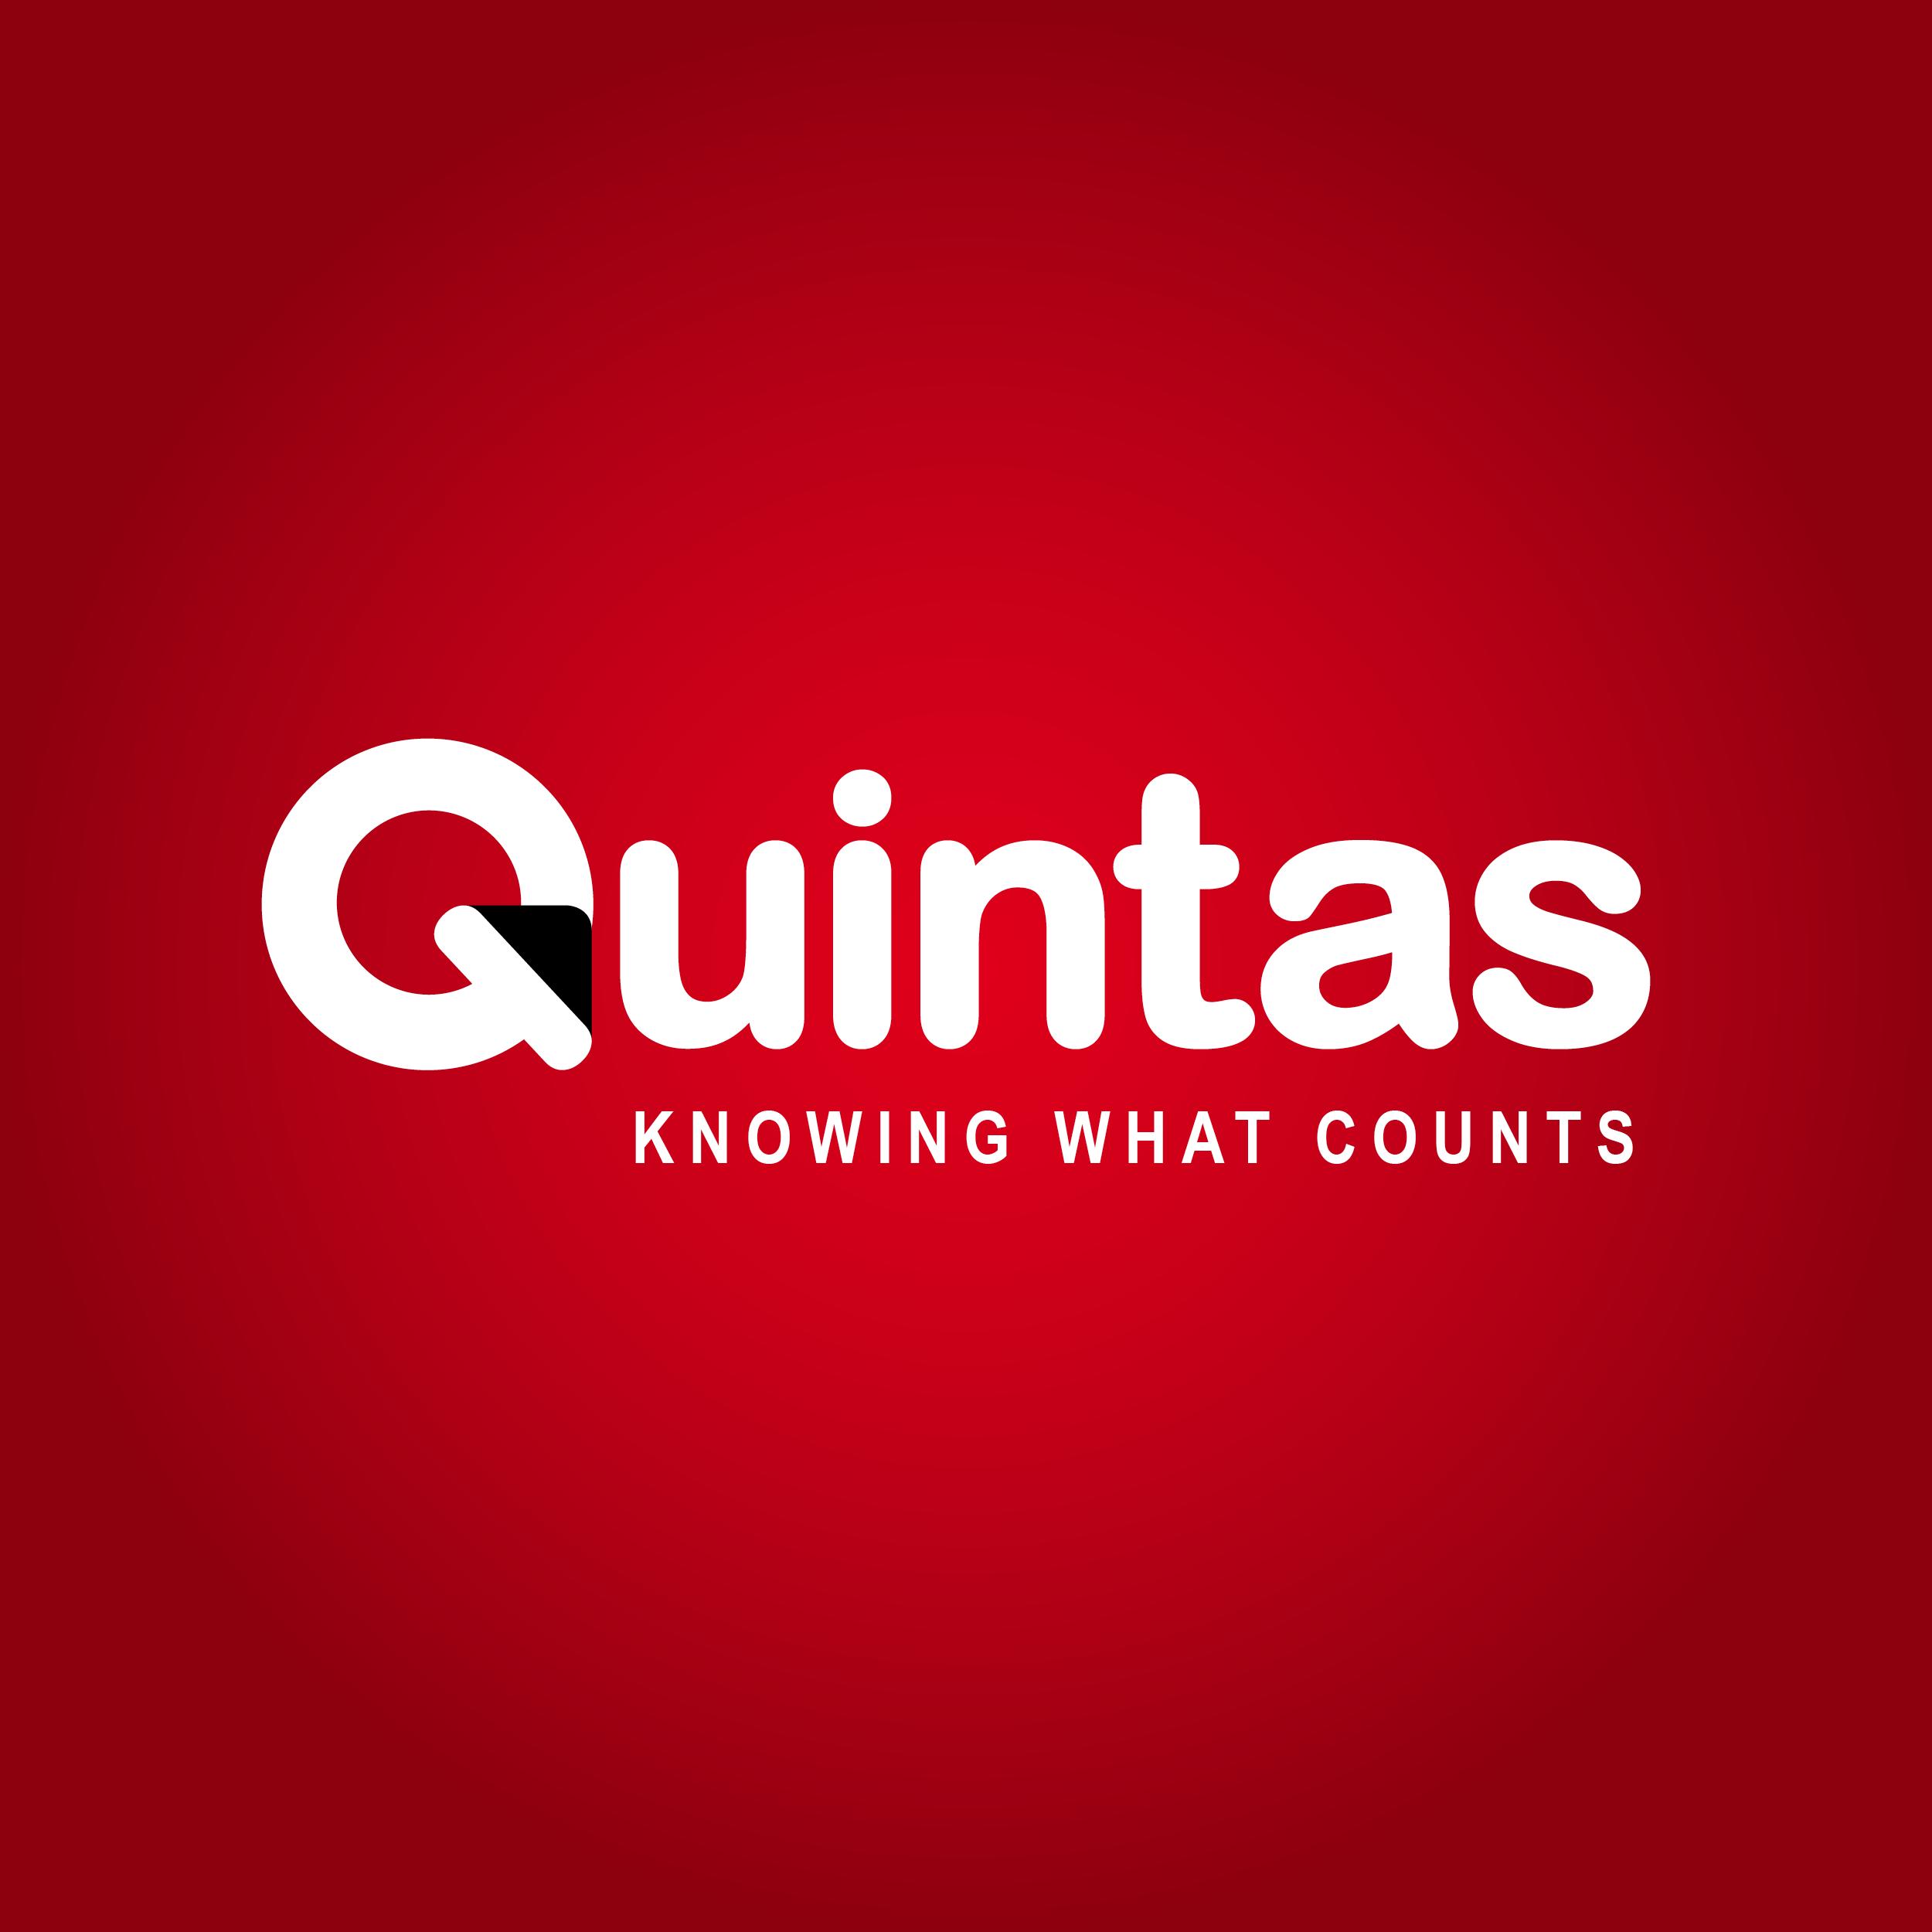 Quintas-Content-Images_2.png